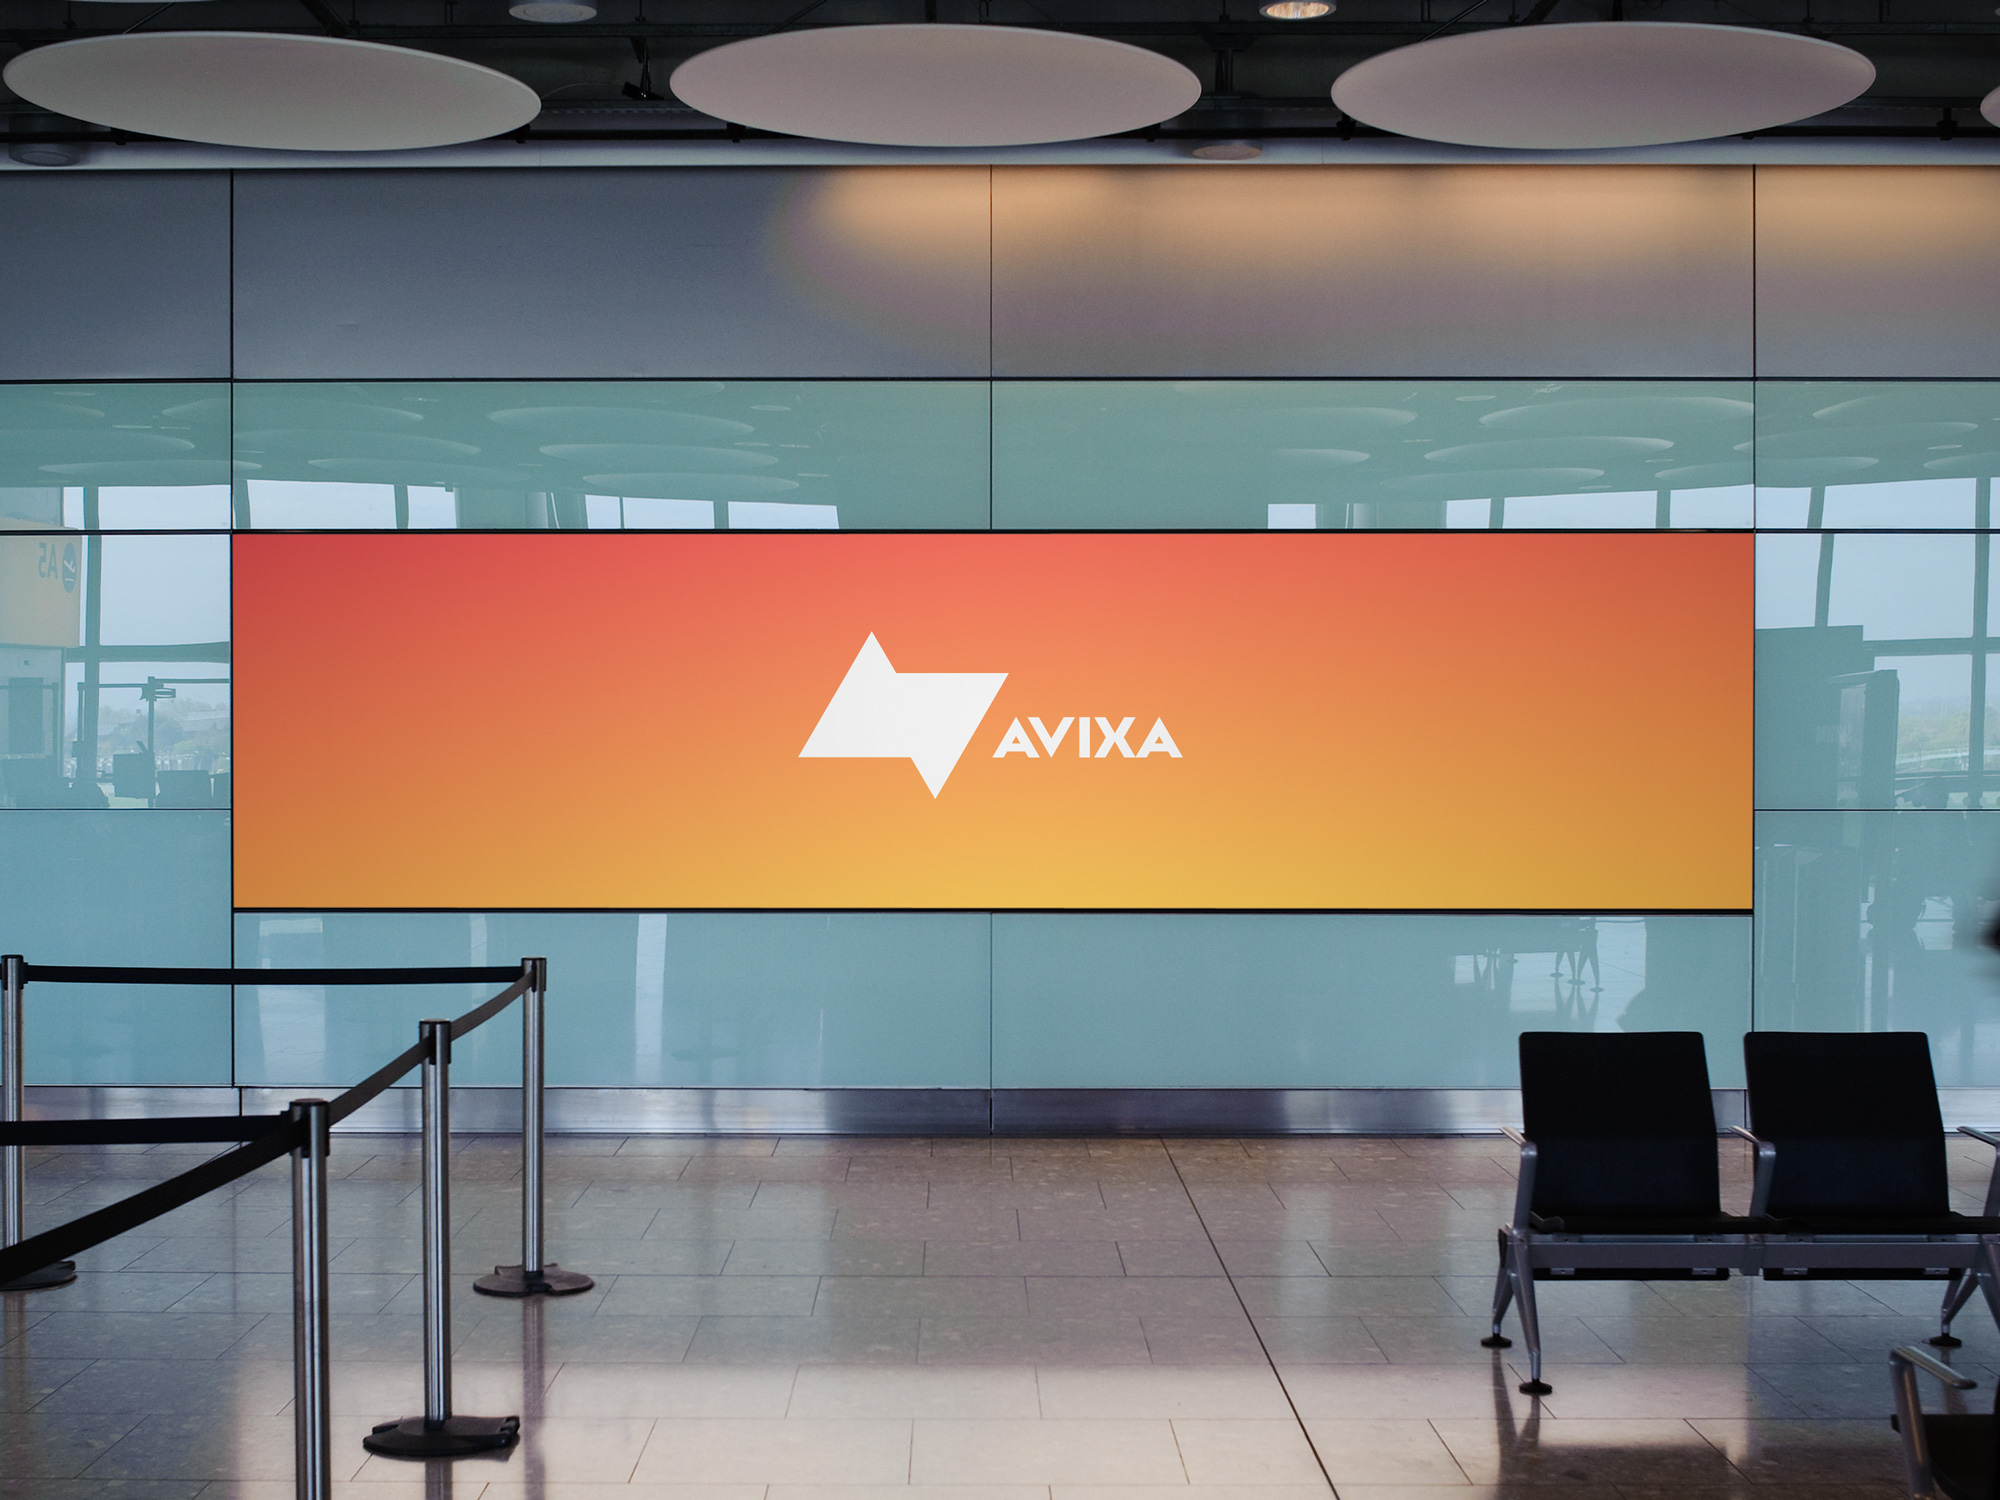 avixa-application-enviromental-2.jpg